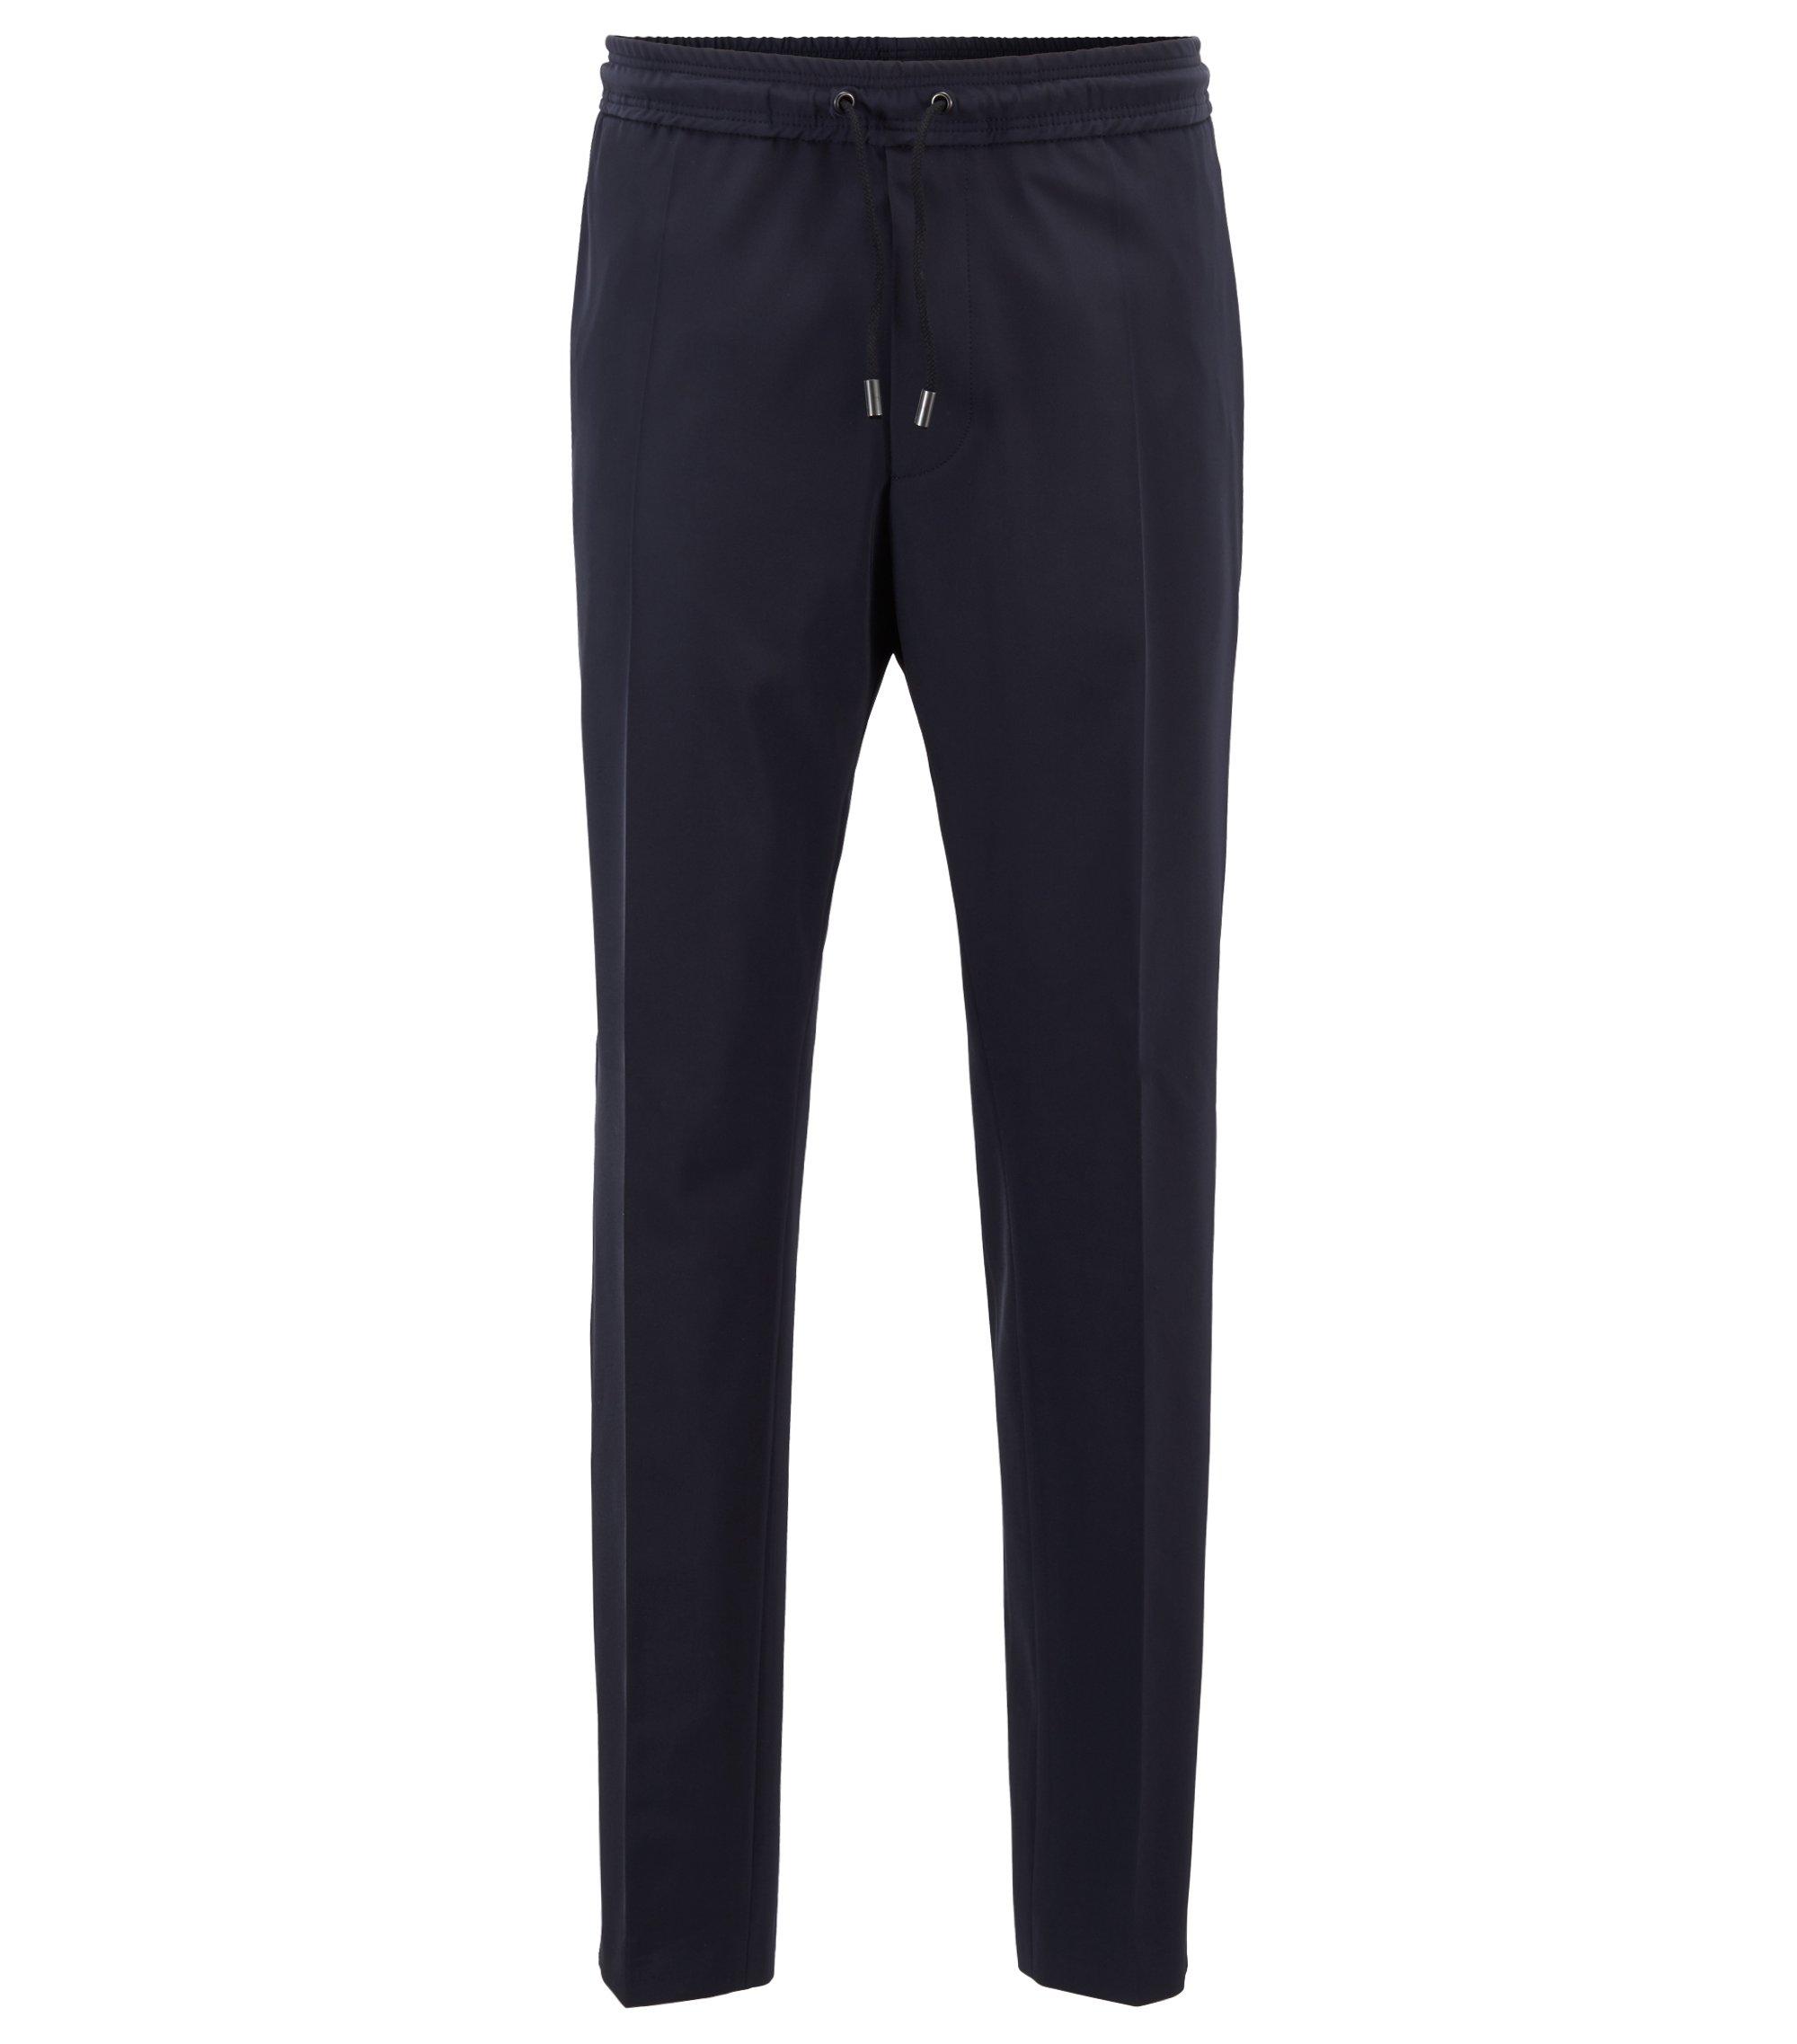 Pantalones de corte ajustado con cinta de satén de la colección cápsula Fashion Show, Azul oscuro